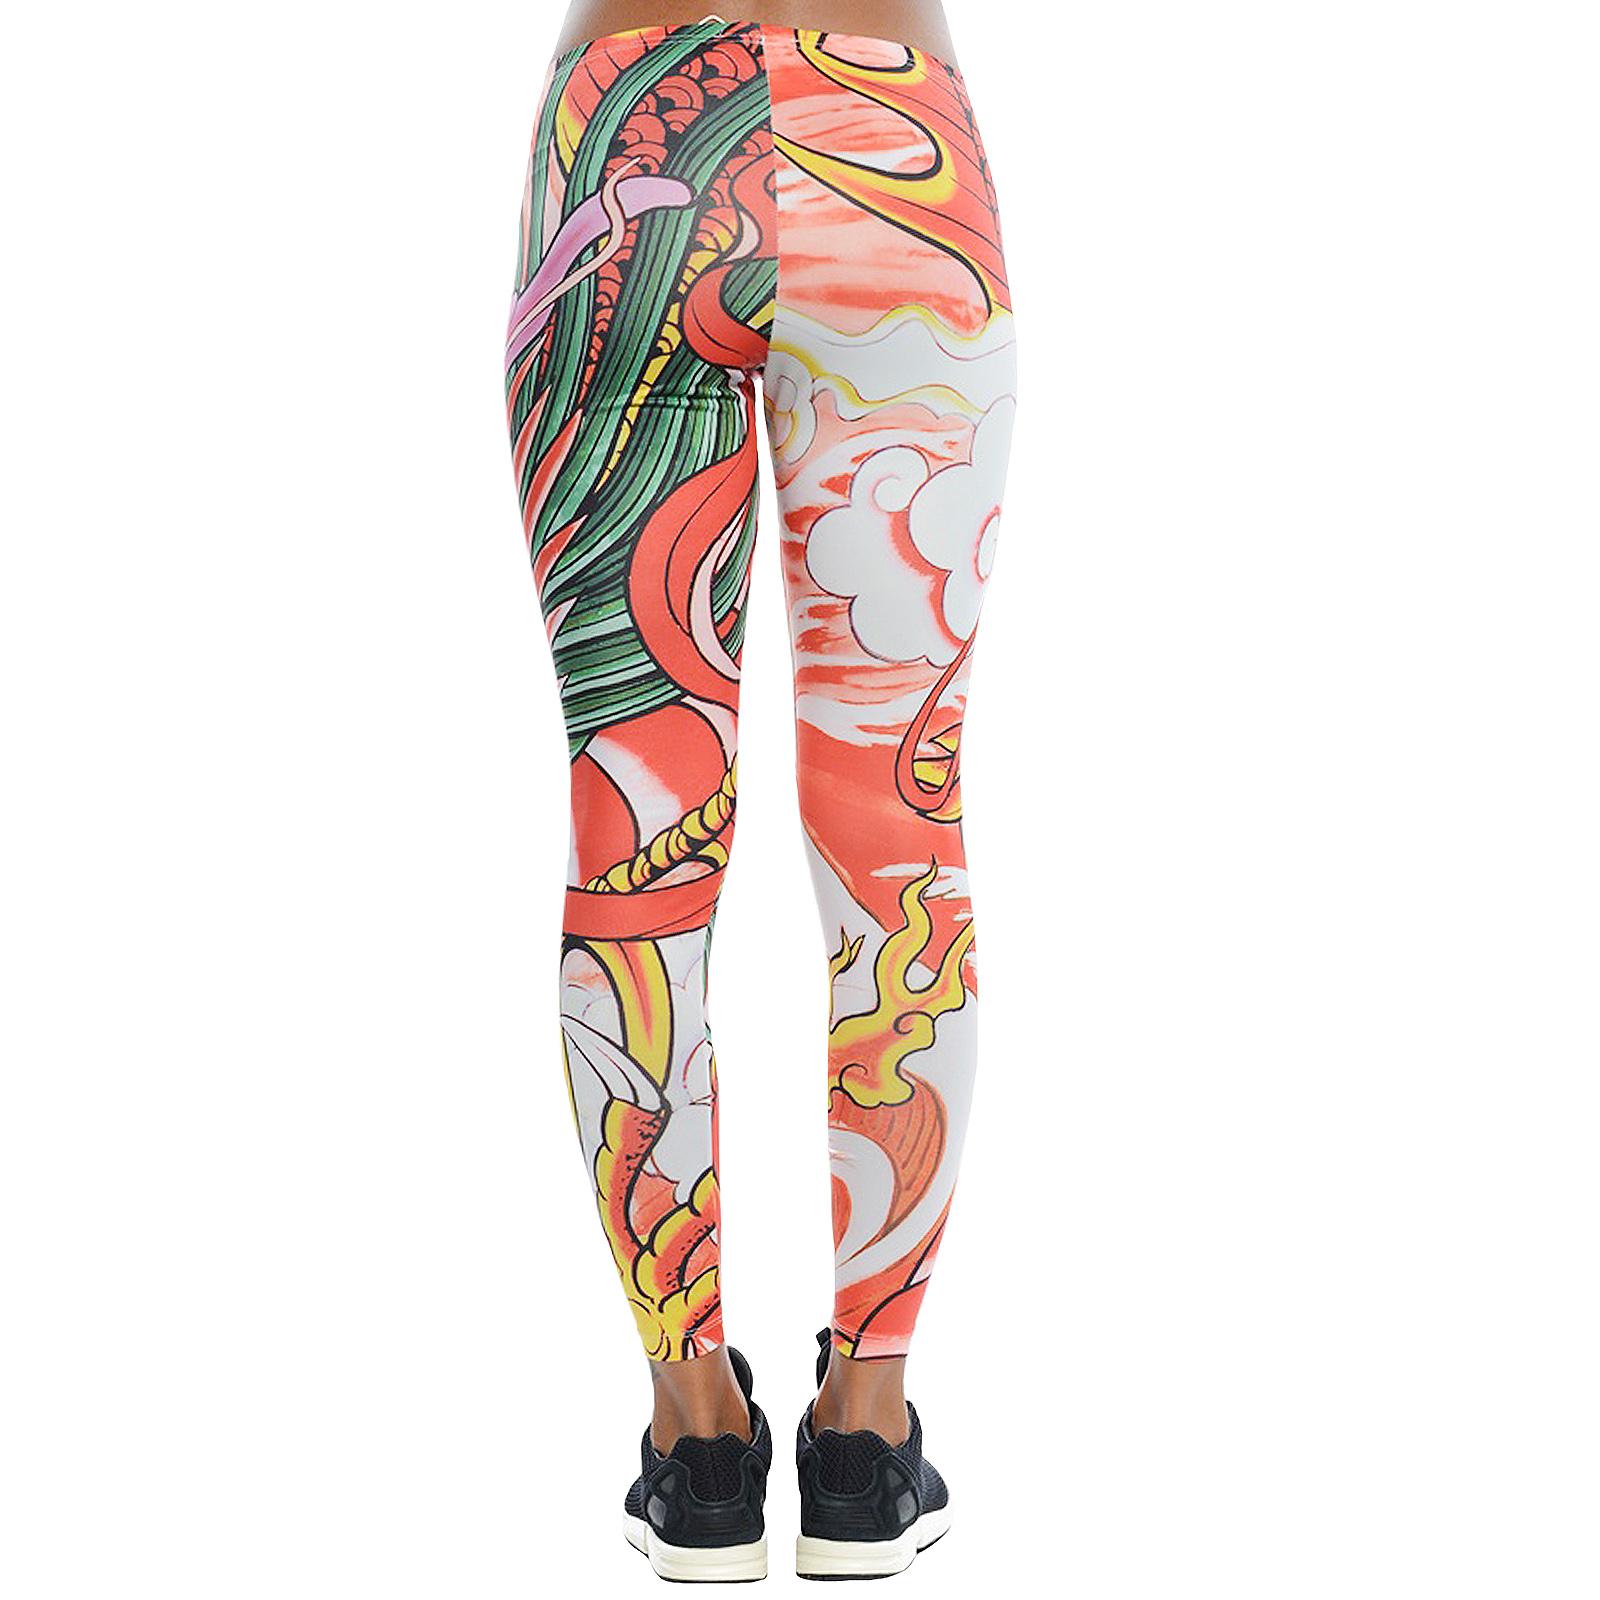 Adidas originali donne rita o drago impronta forte leggings pantaloni